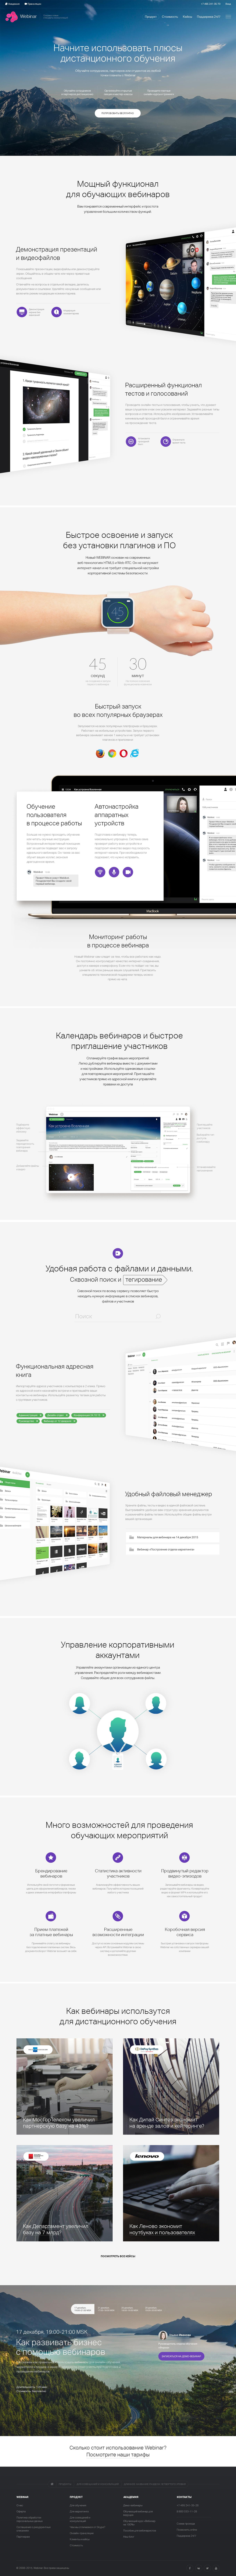 webinar_product_learning